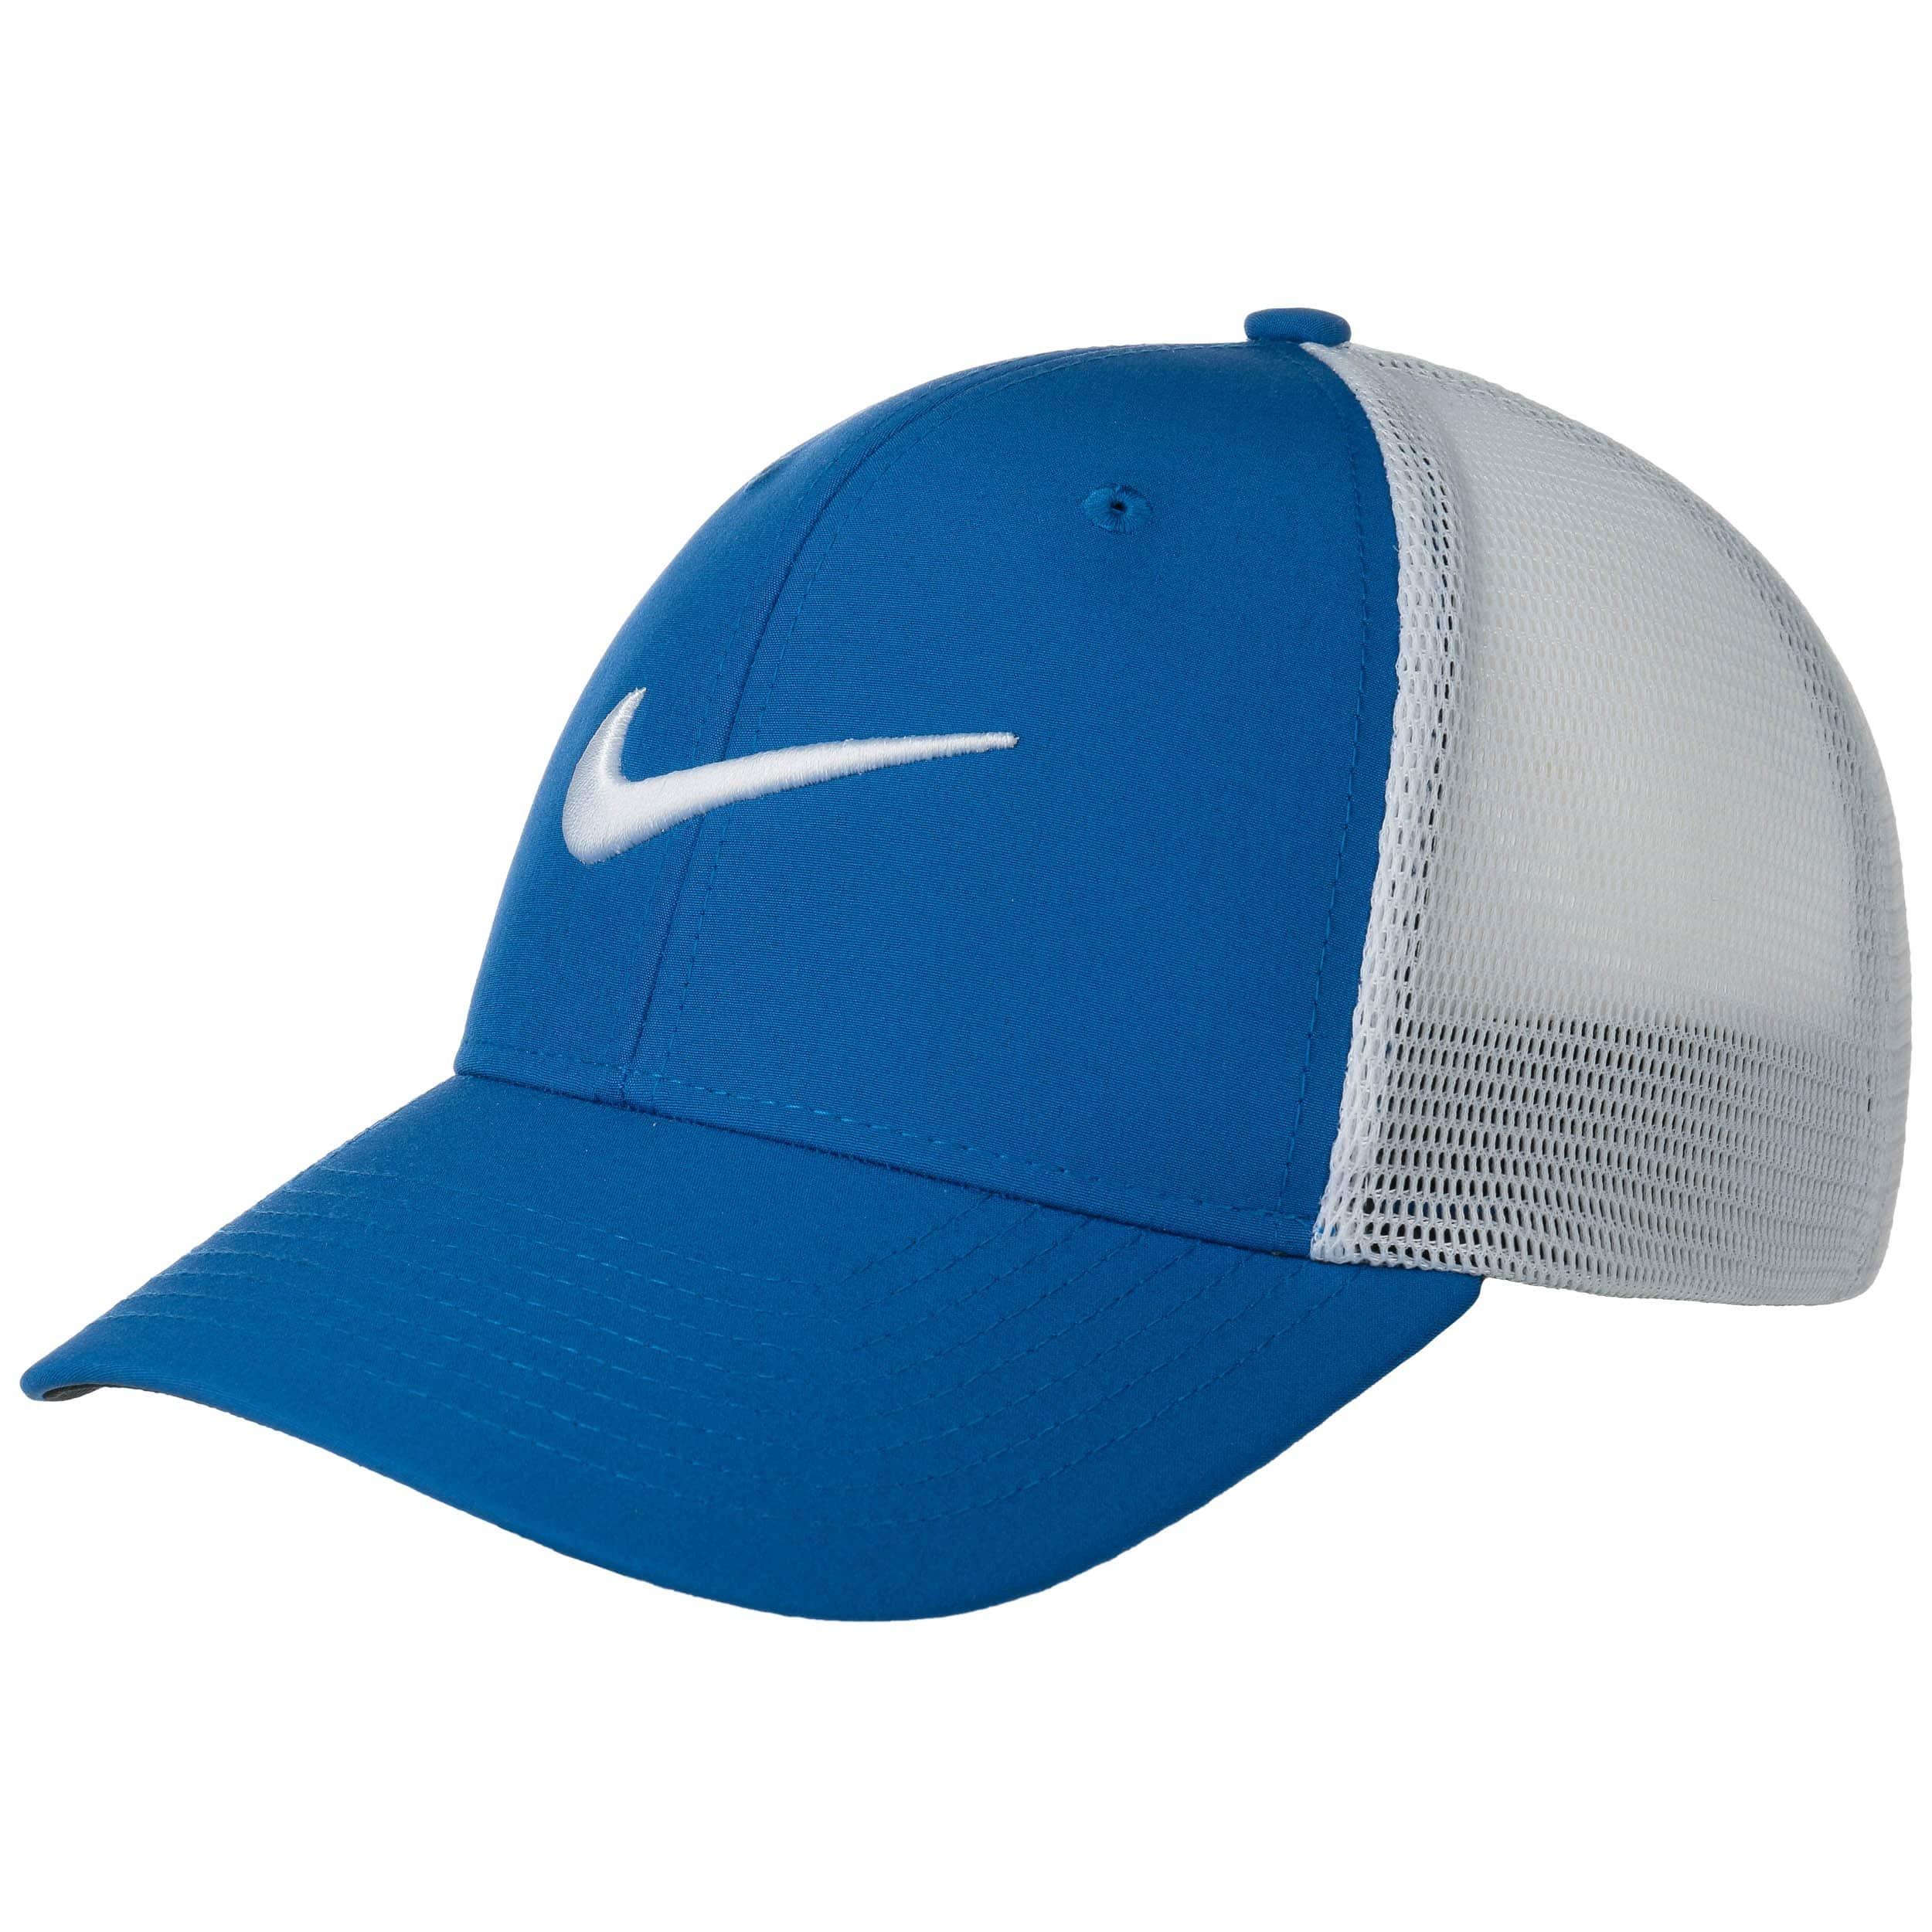 práctico bisonte helado  Legacy91 Flexfit Mesh Fitted Cap by Nike - 37,95 €